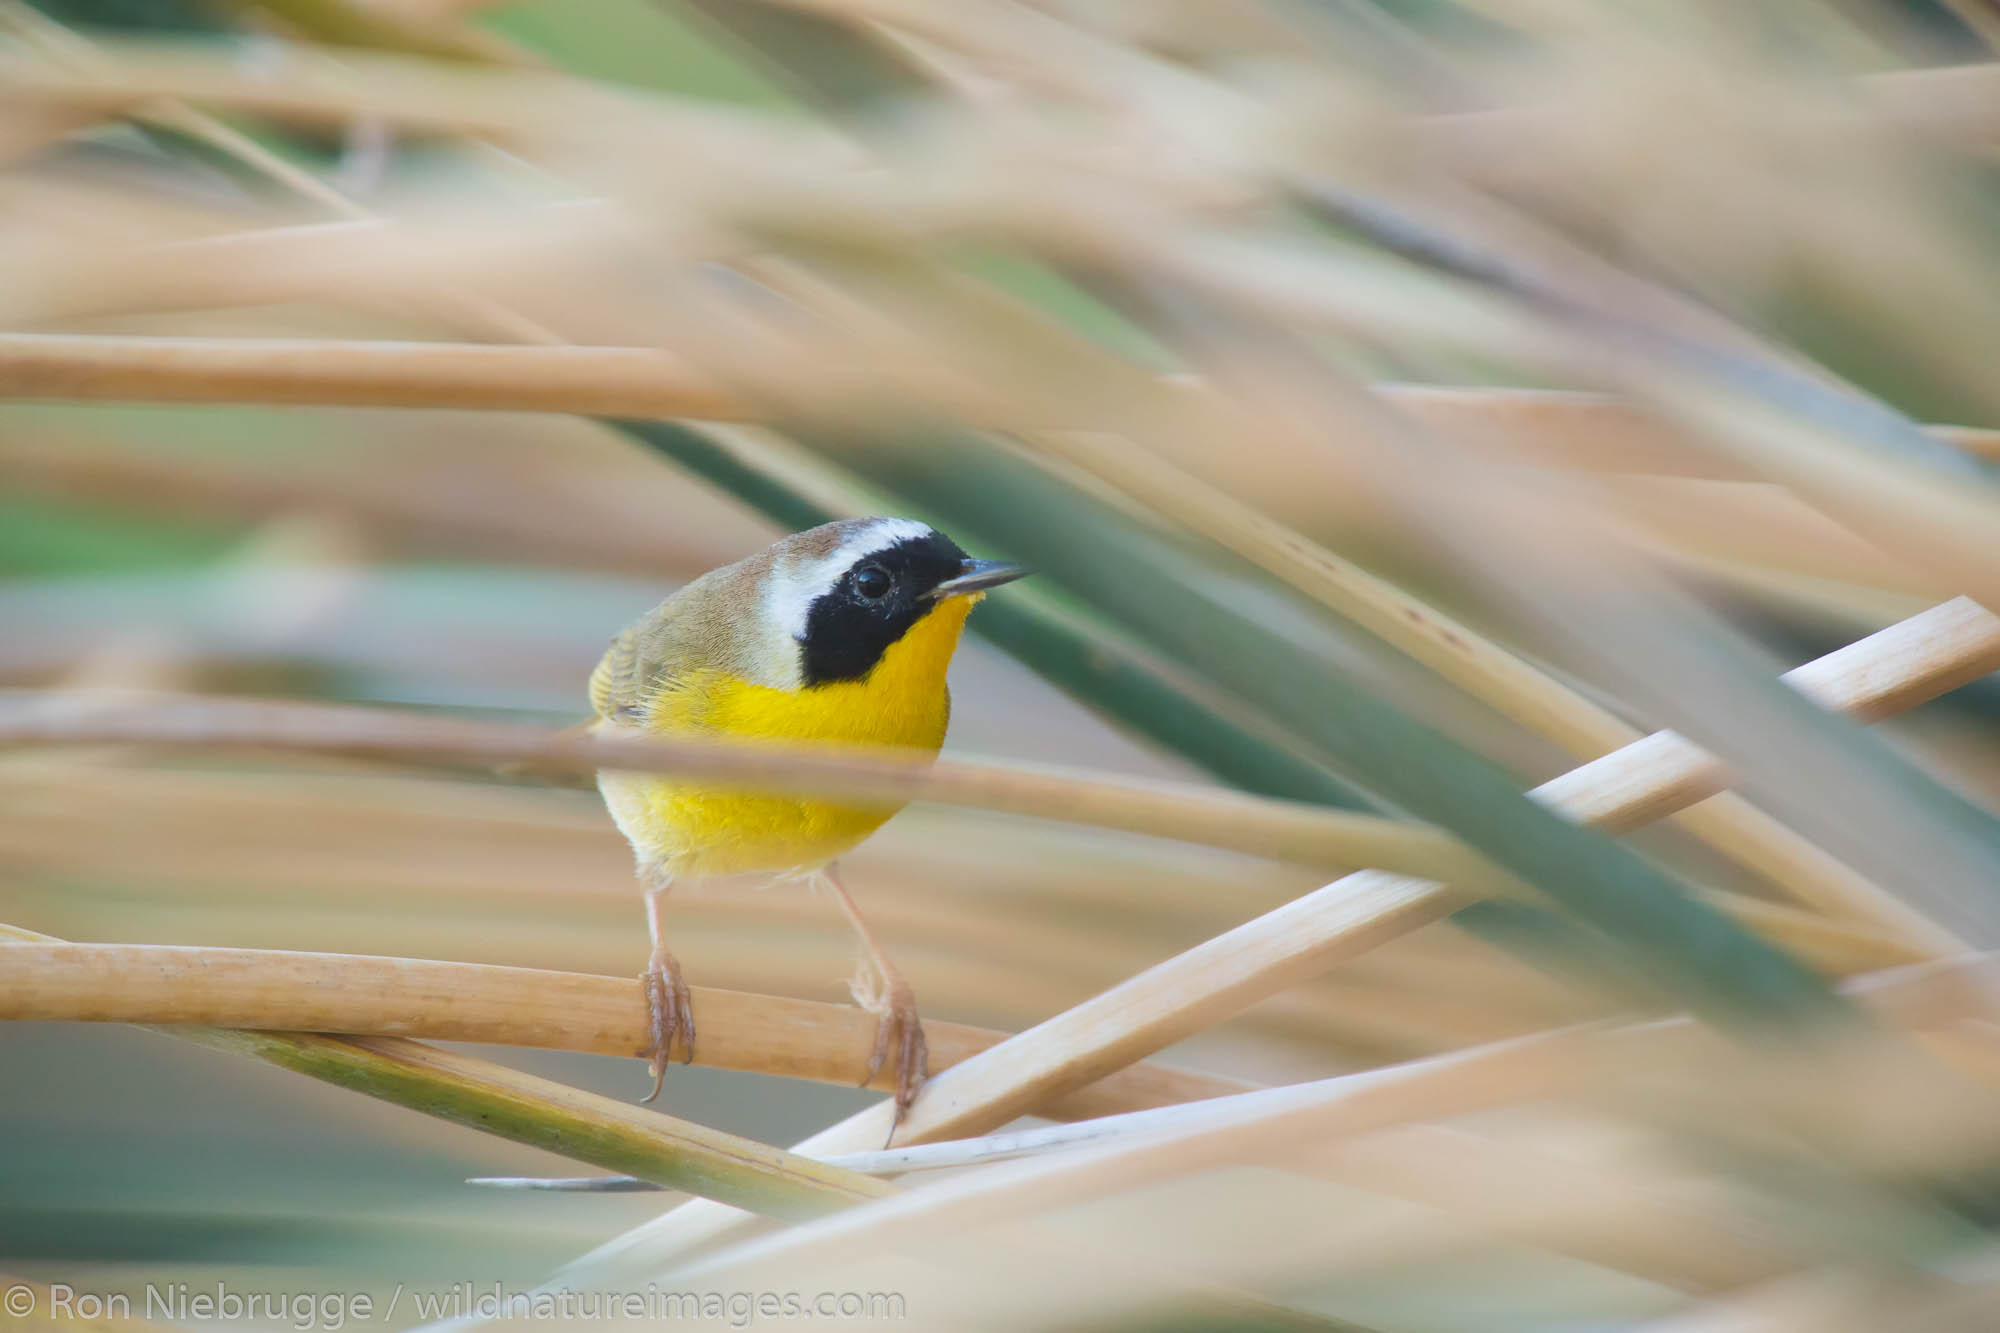 Common Yellowthroat (Geothlypis trichas), Borrego Springs, California.